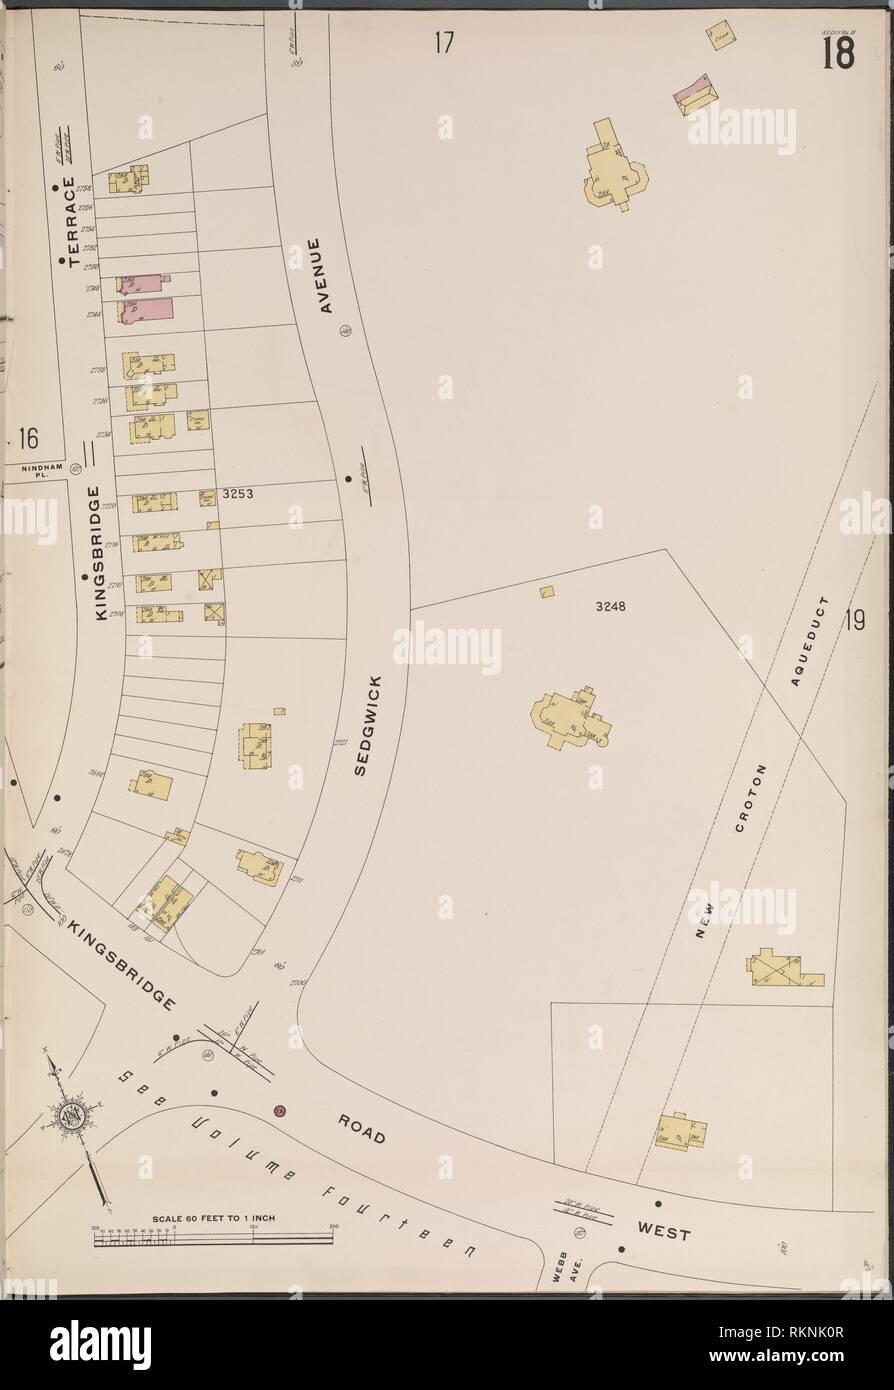 Bronx, V. 13, Plate No. 18 [Map bounded by Kingsbridge Terrace, New Croton Aqueduct, Kingsbridge Road West.]. Sanborn Map Company (Publisher). Stock Photo